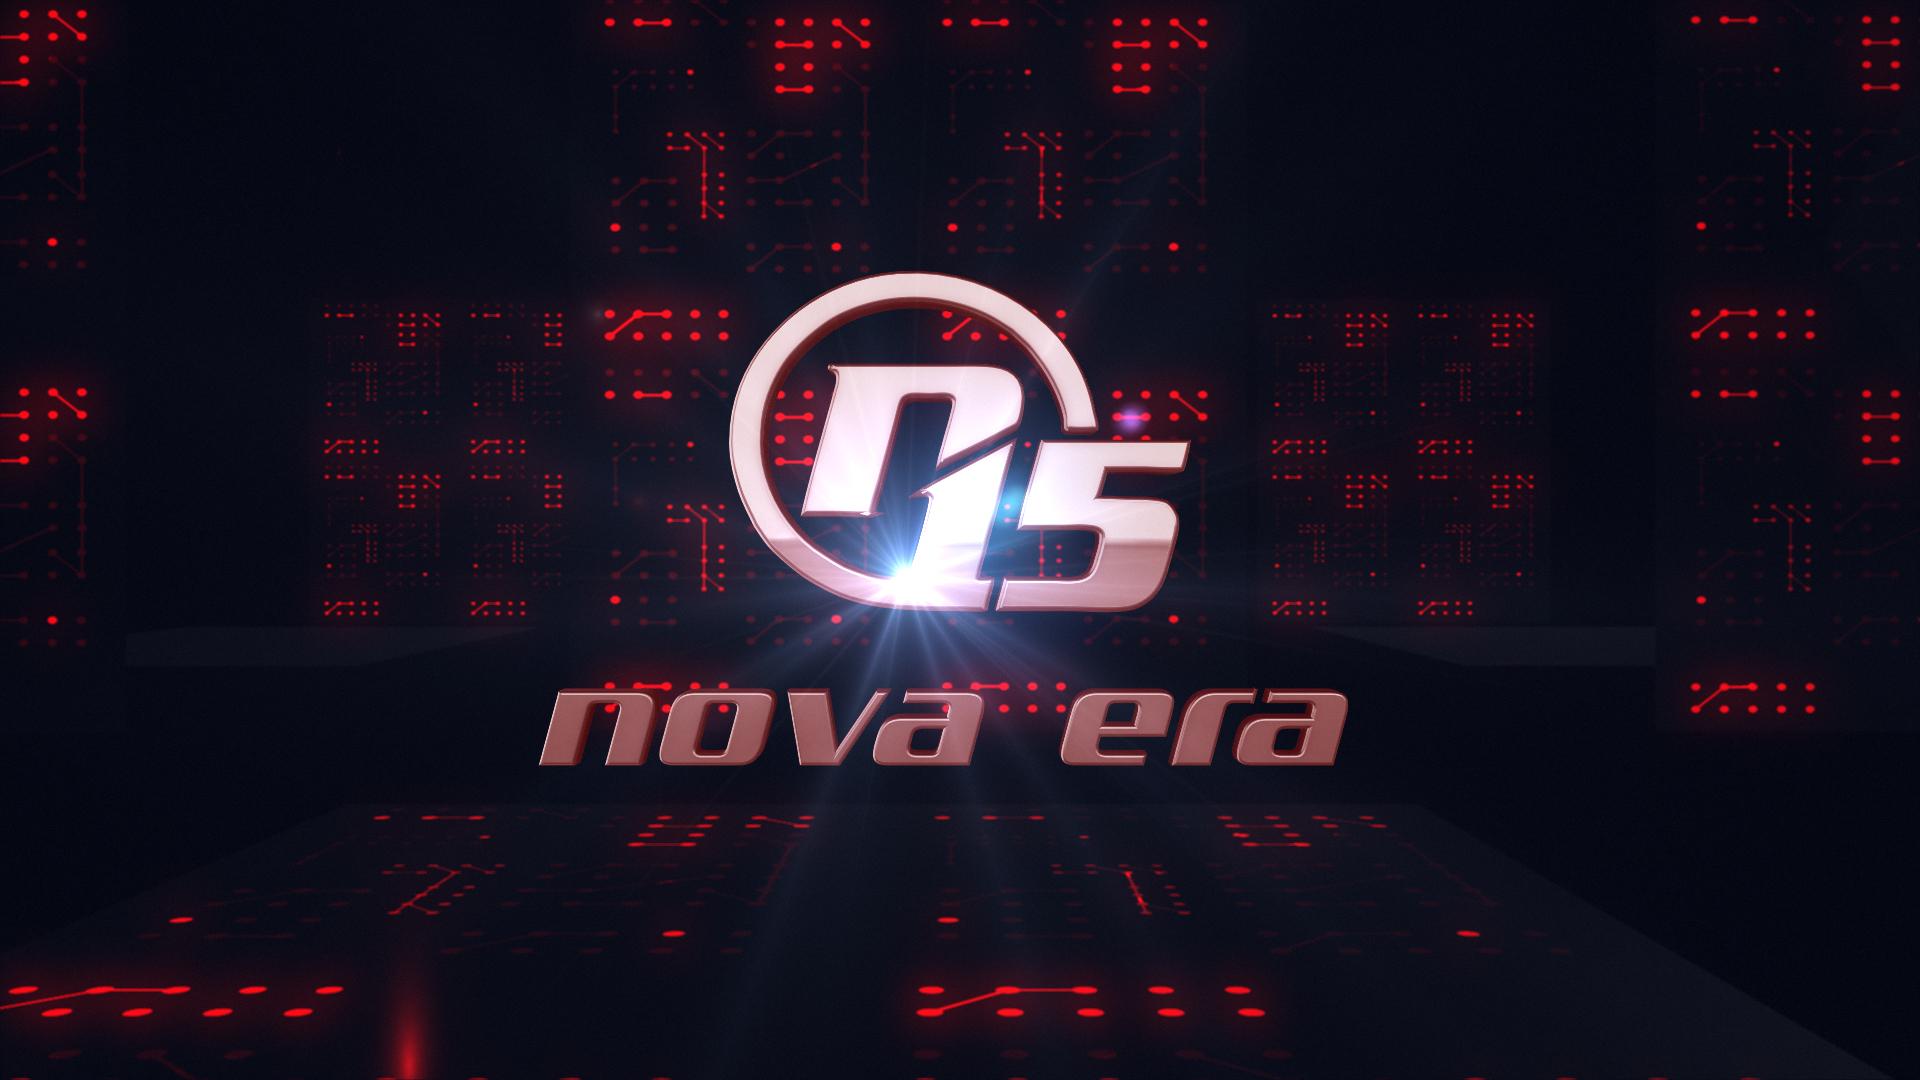 The New Era_Event